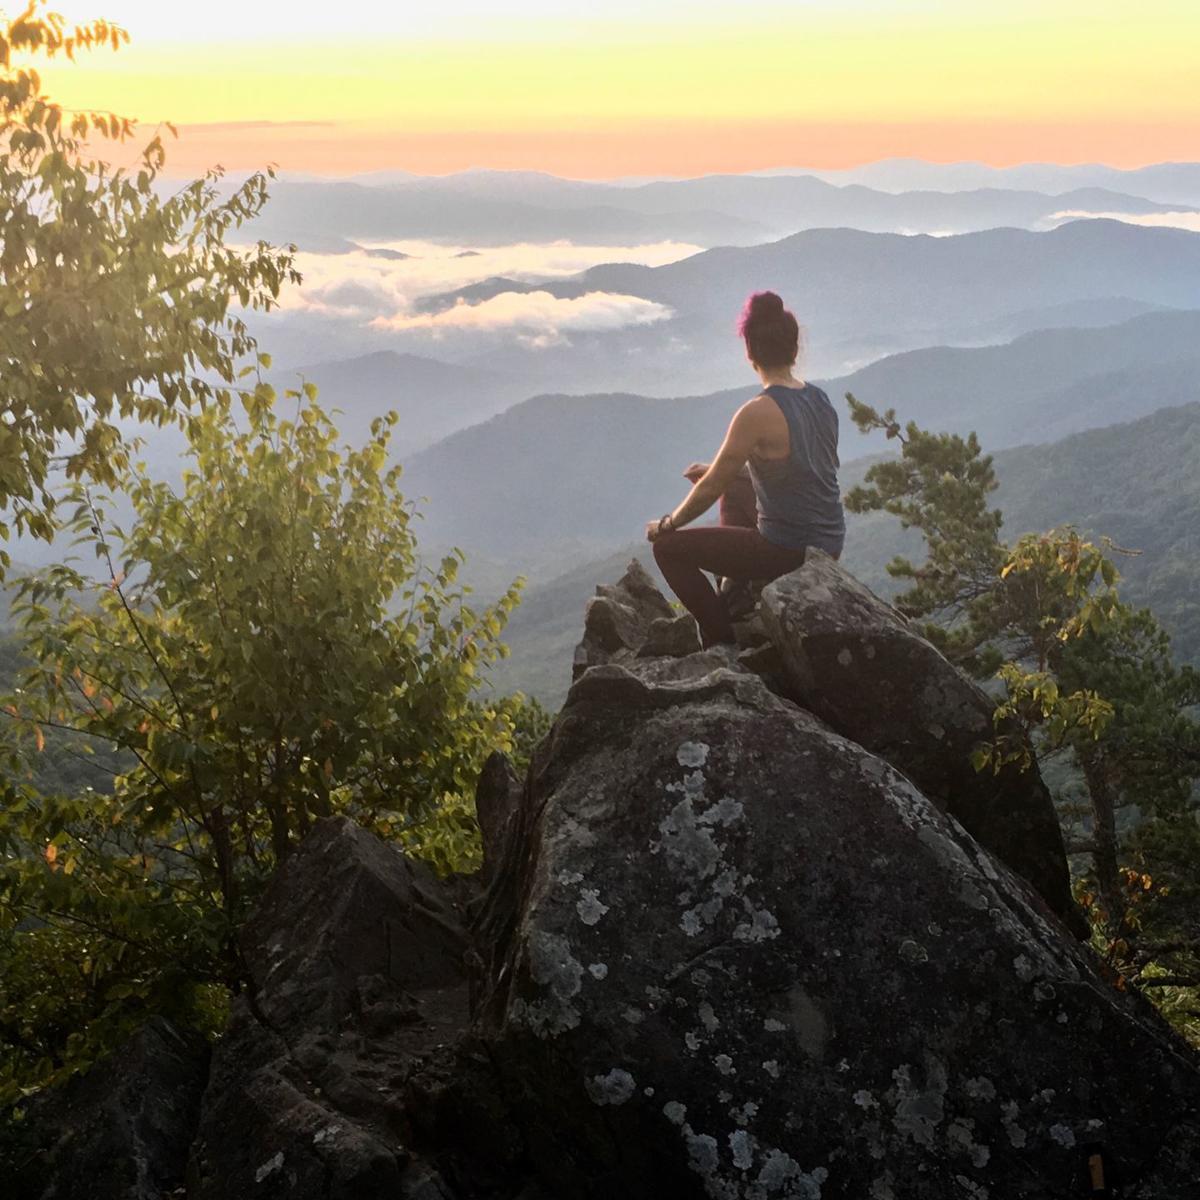 Cynthia Viola overlooking mountains